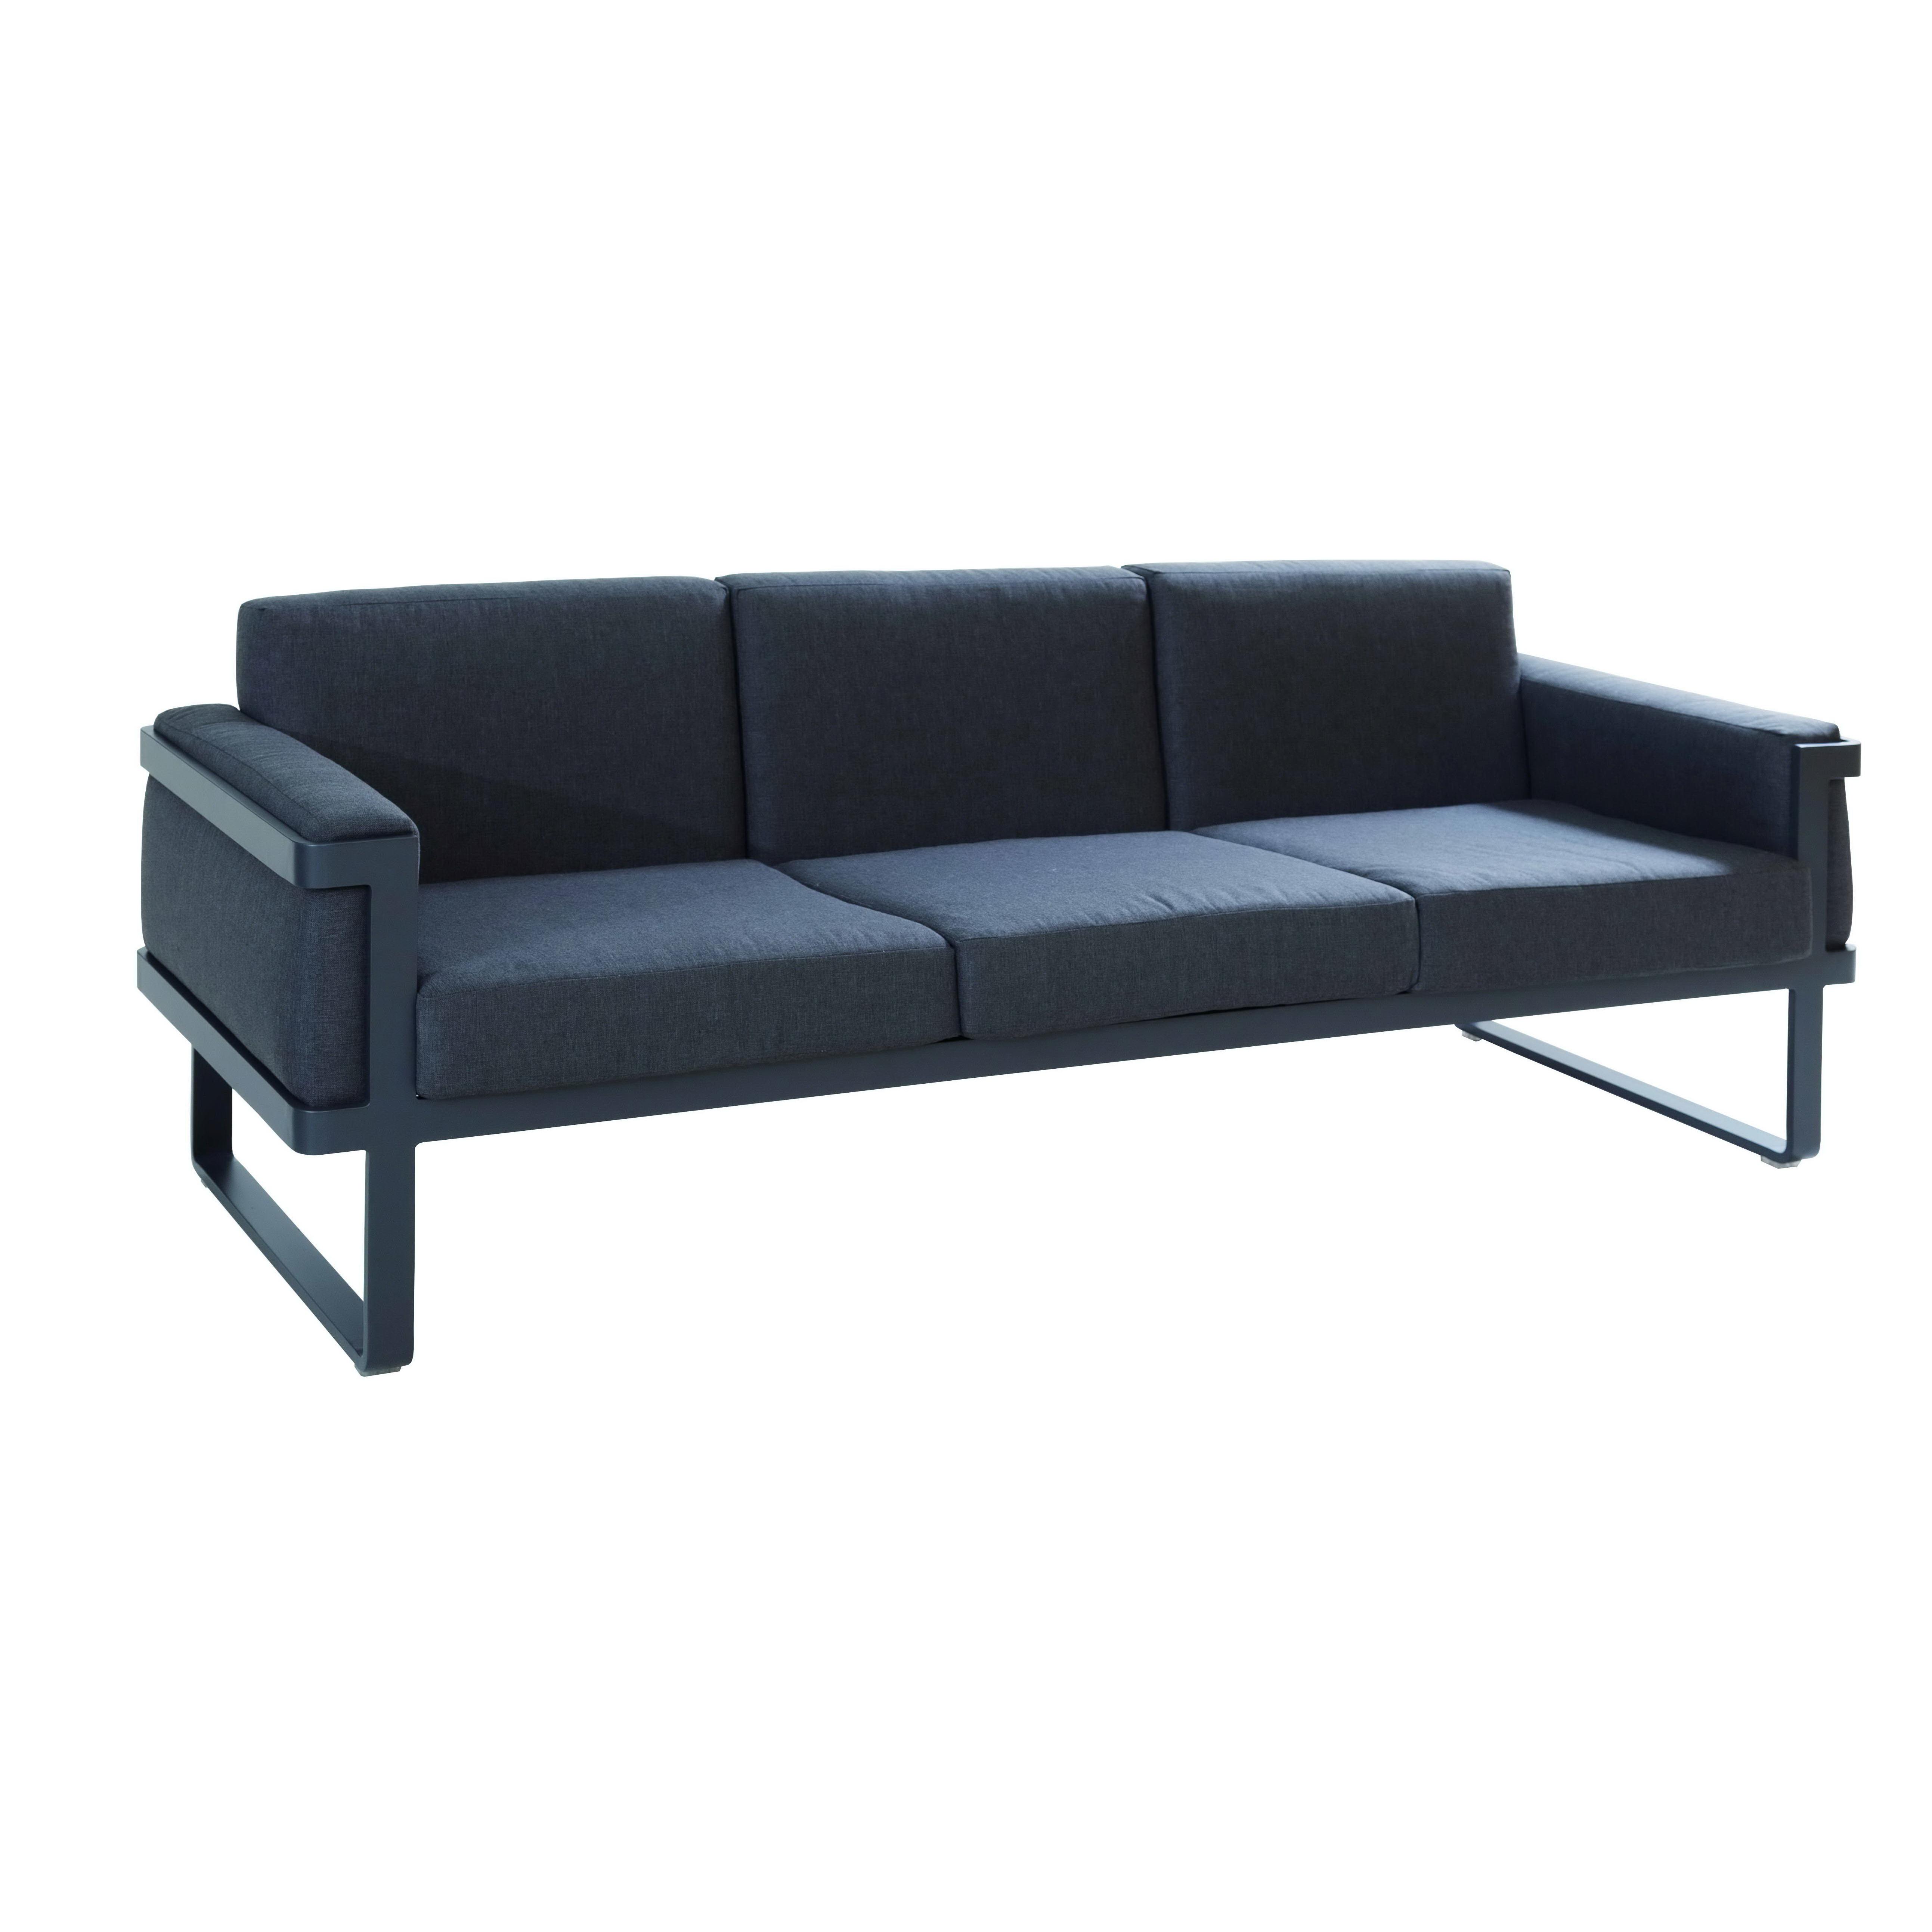 Florida Seating PB 3-SEAT SOFA sofa seating, outdoor